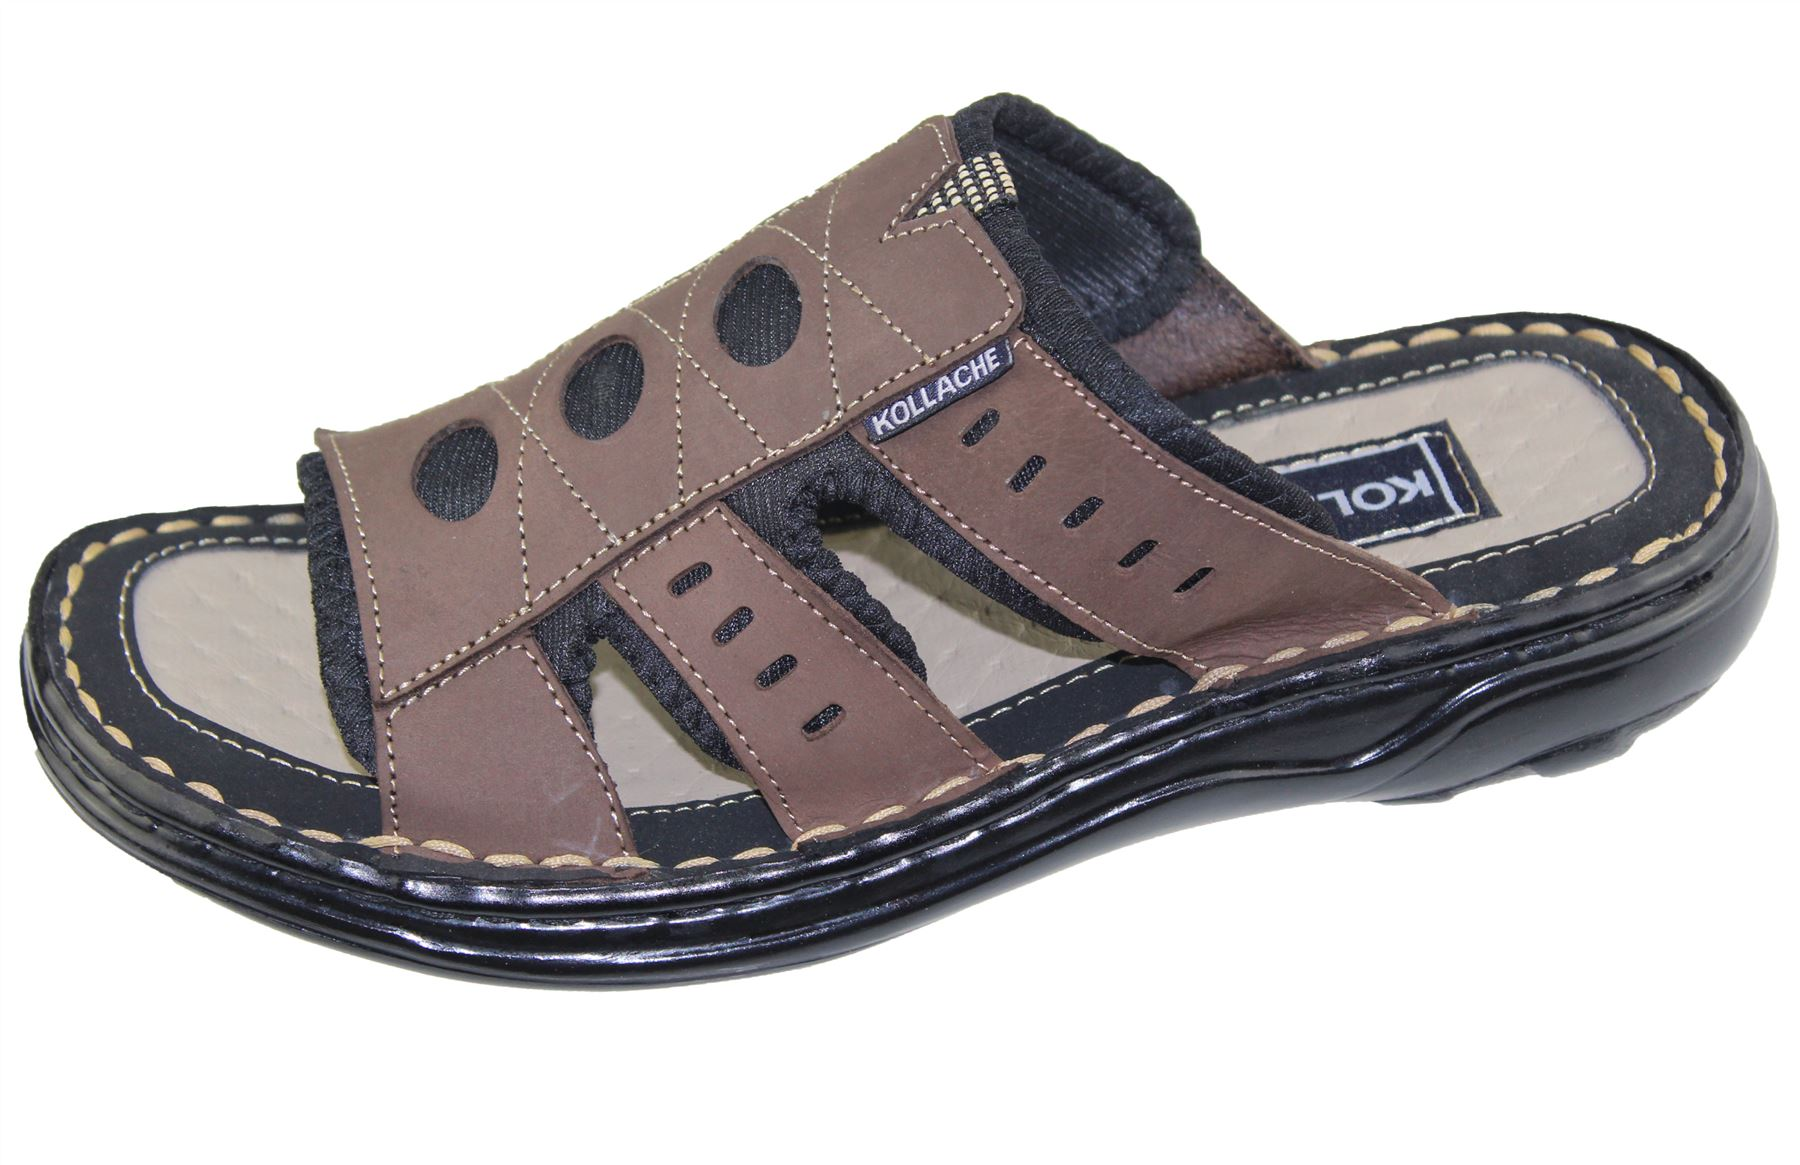 Mens-Slipper-Sandal-Sports-Beach-Buckle-Walking-Fashion-Summer-Casual-Shoes-Size miniatura 22